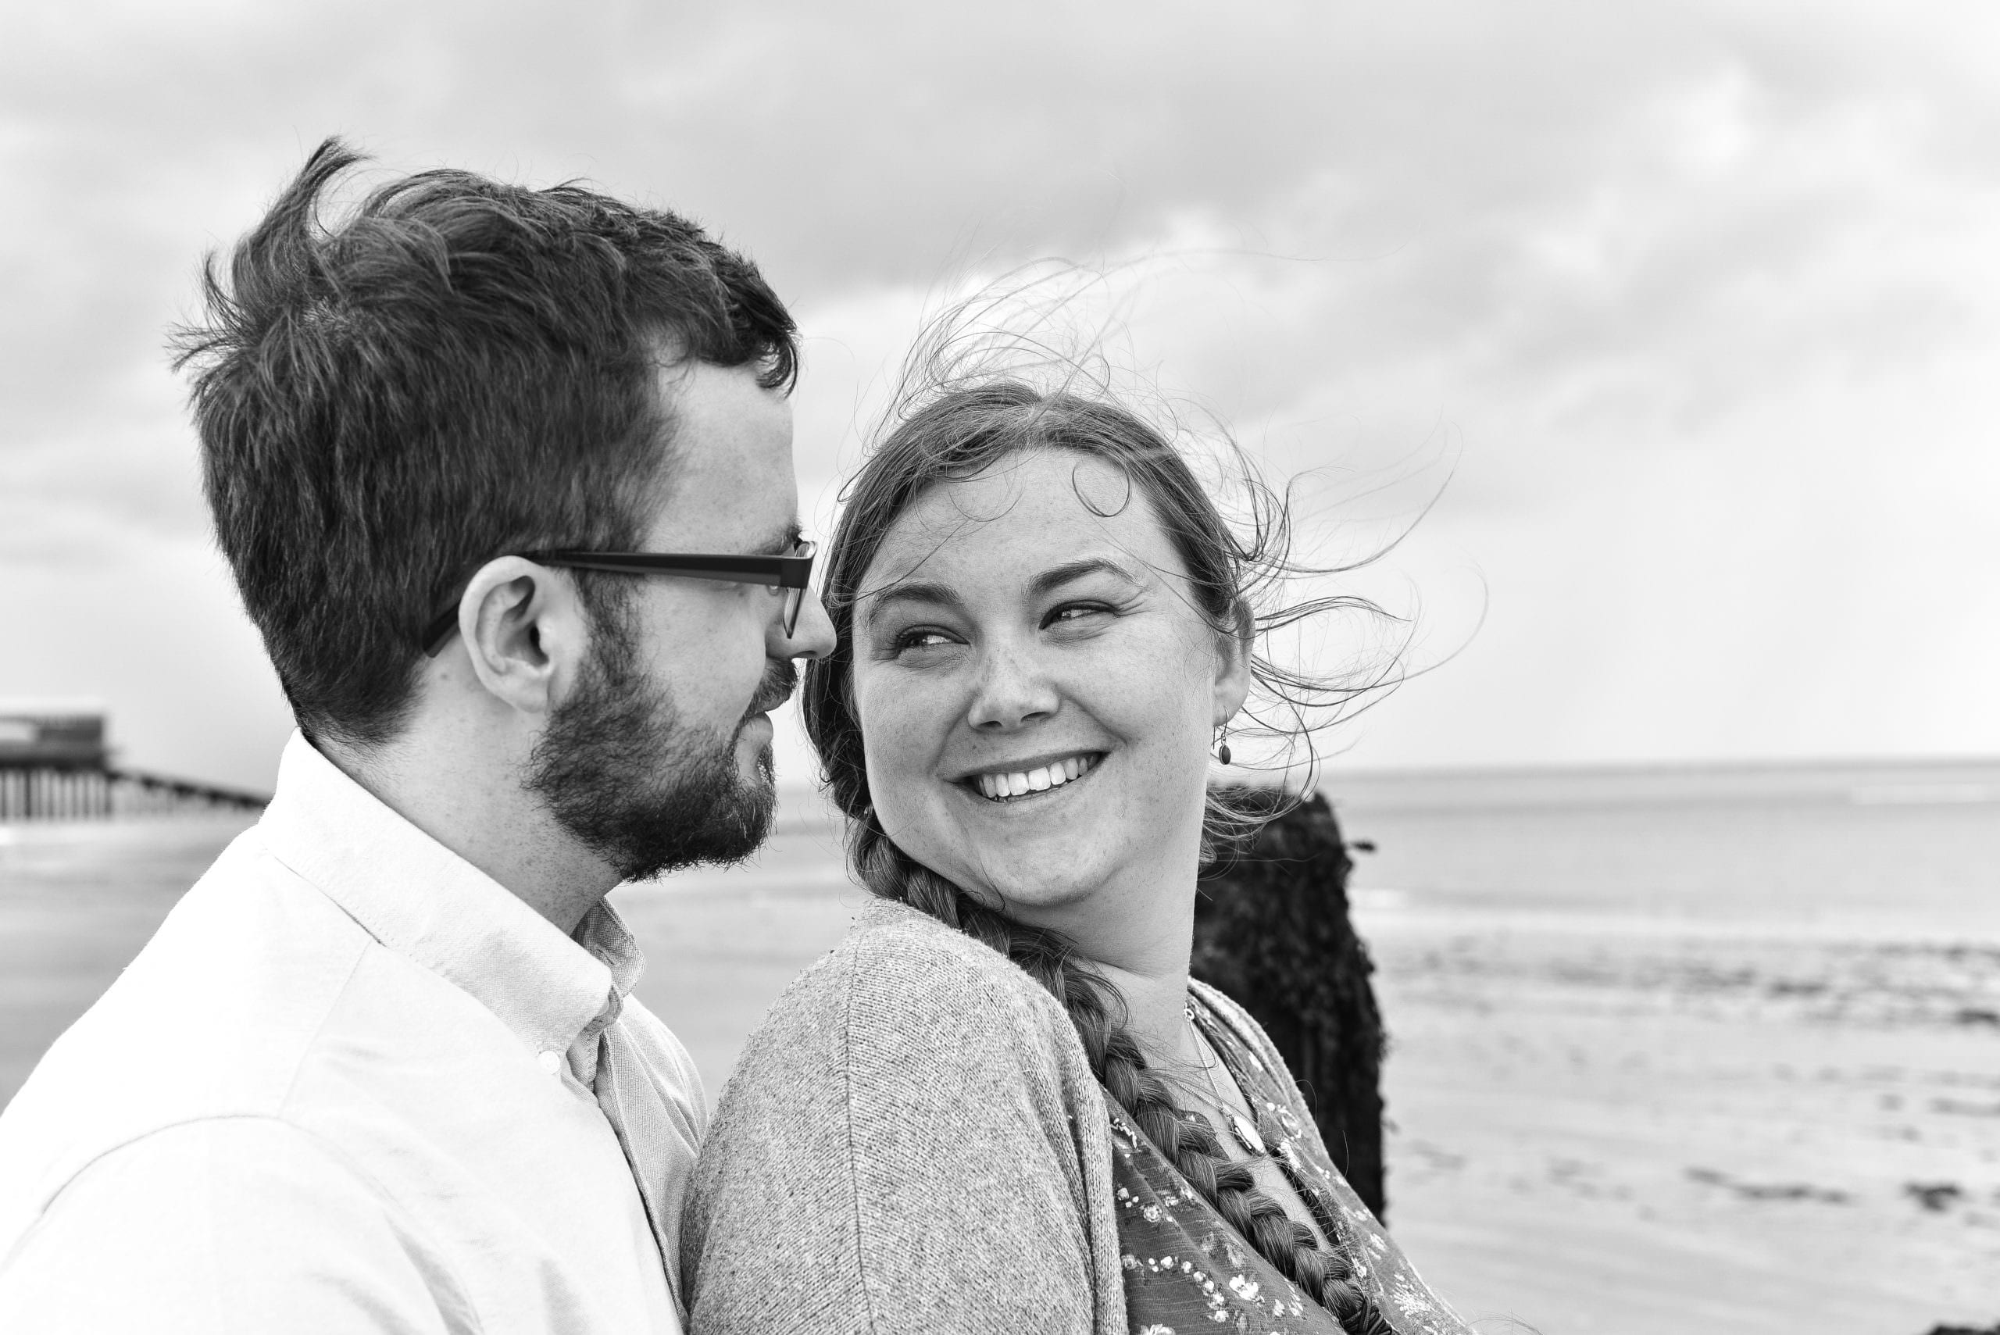 In love photoshoot in Cromer, Norfolk